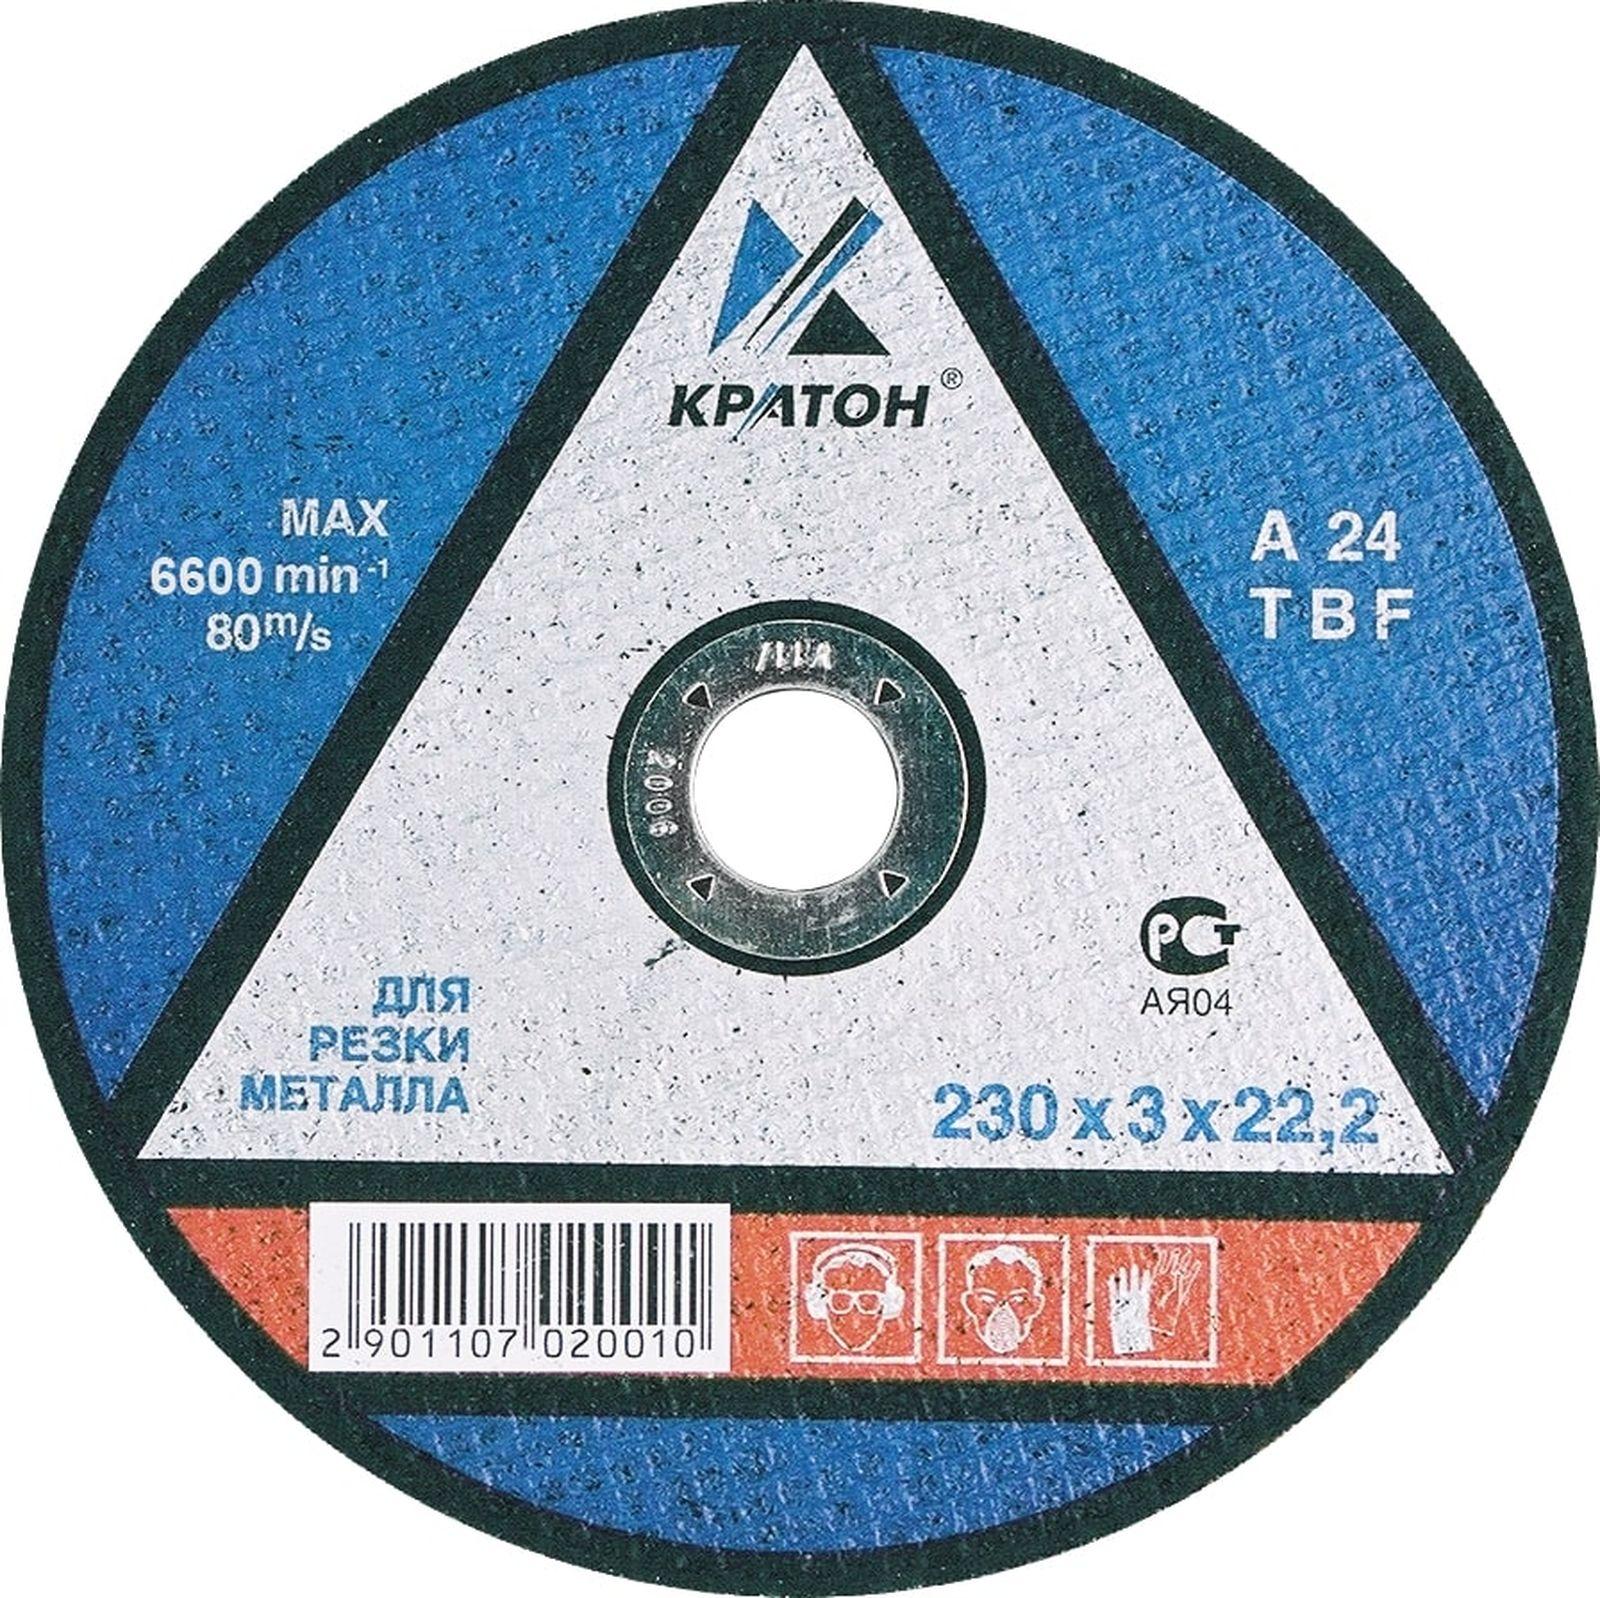 Круг отрезной по металлу Кратон A30TBF, 1 07 02 012, 400 х 32 х 3,2 мм круг отрезной по graff по металлу 115 х 1 6 х 22 23 мм